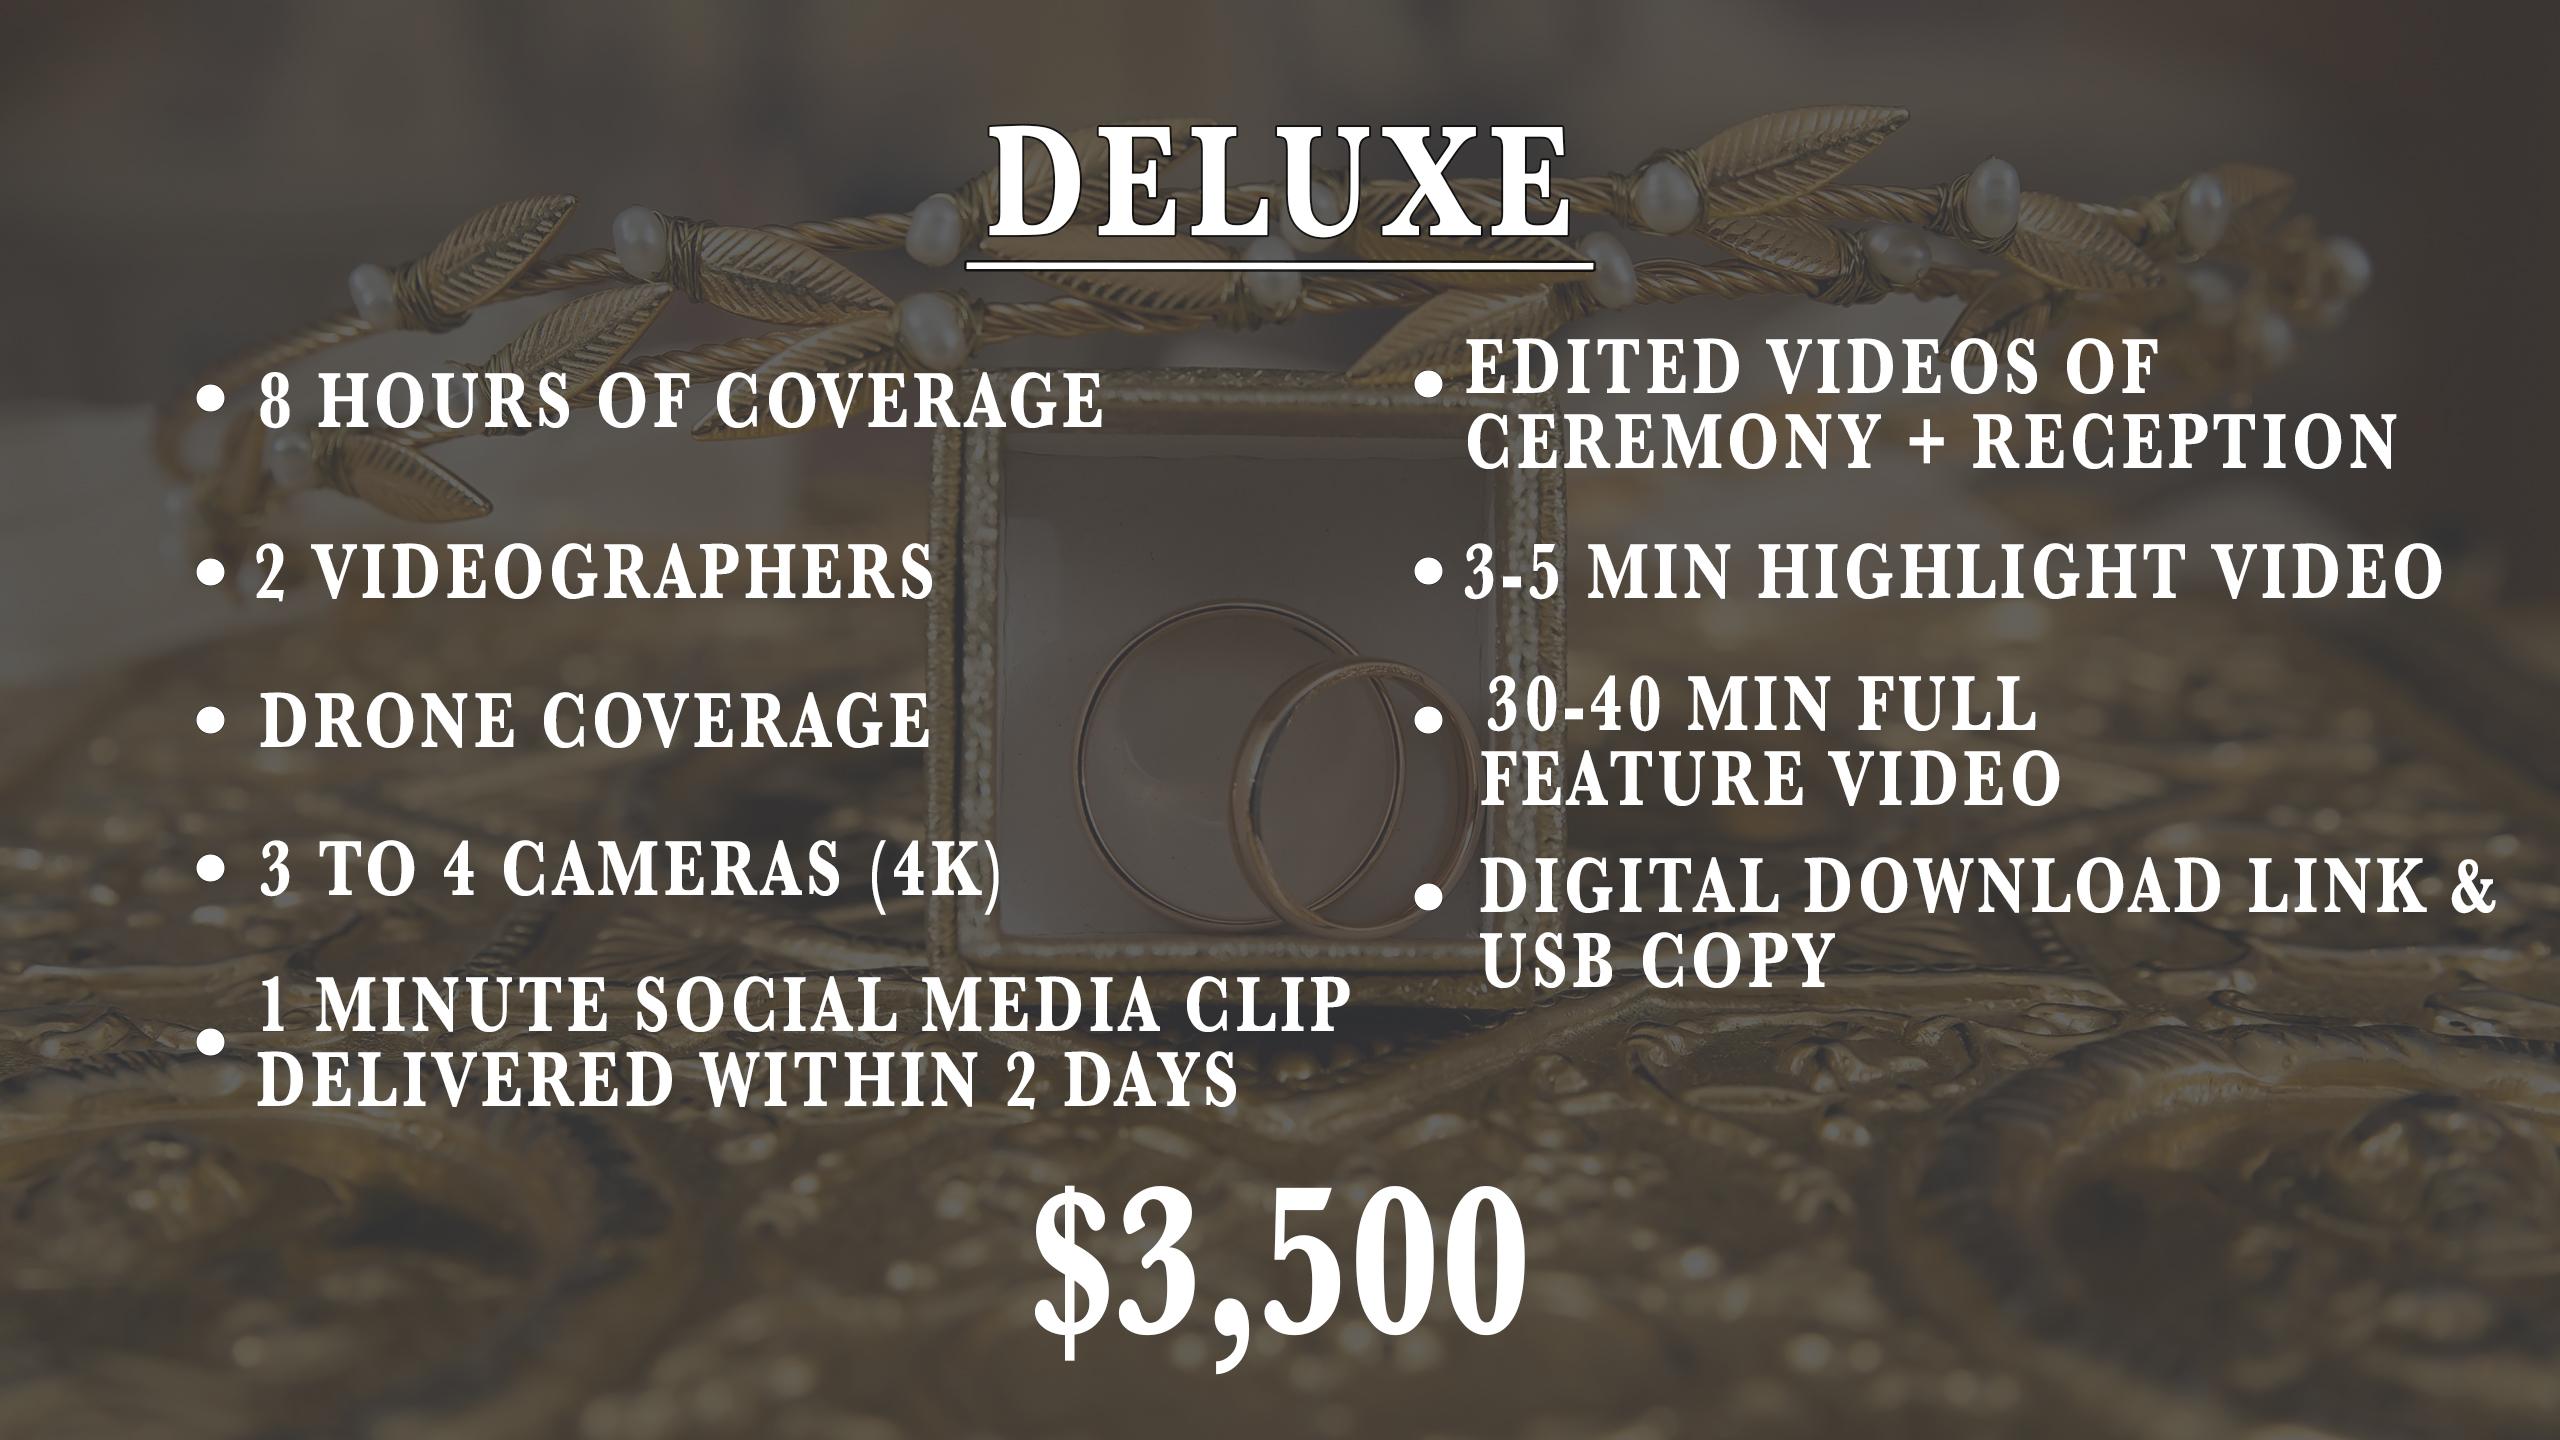 Deluxe Package